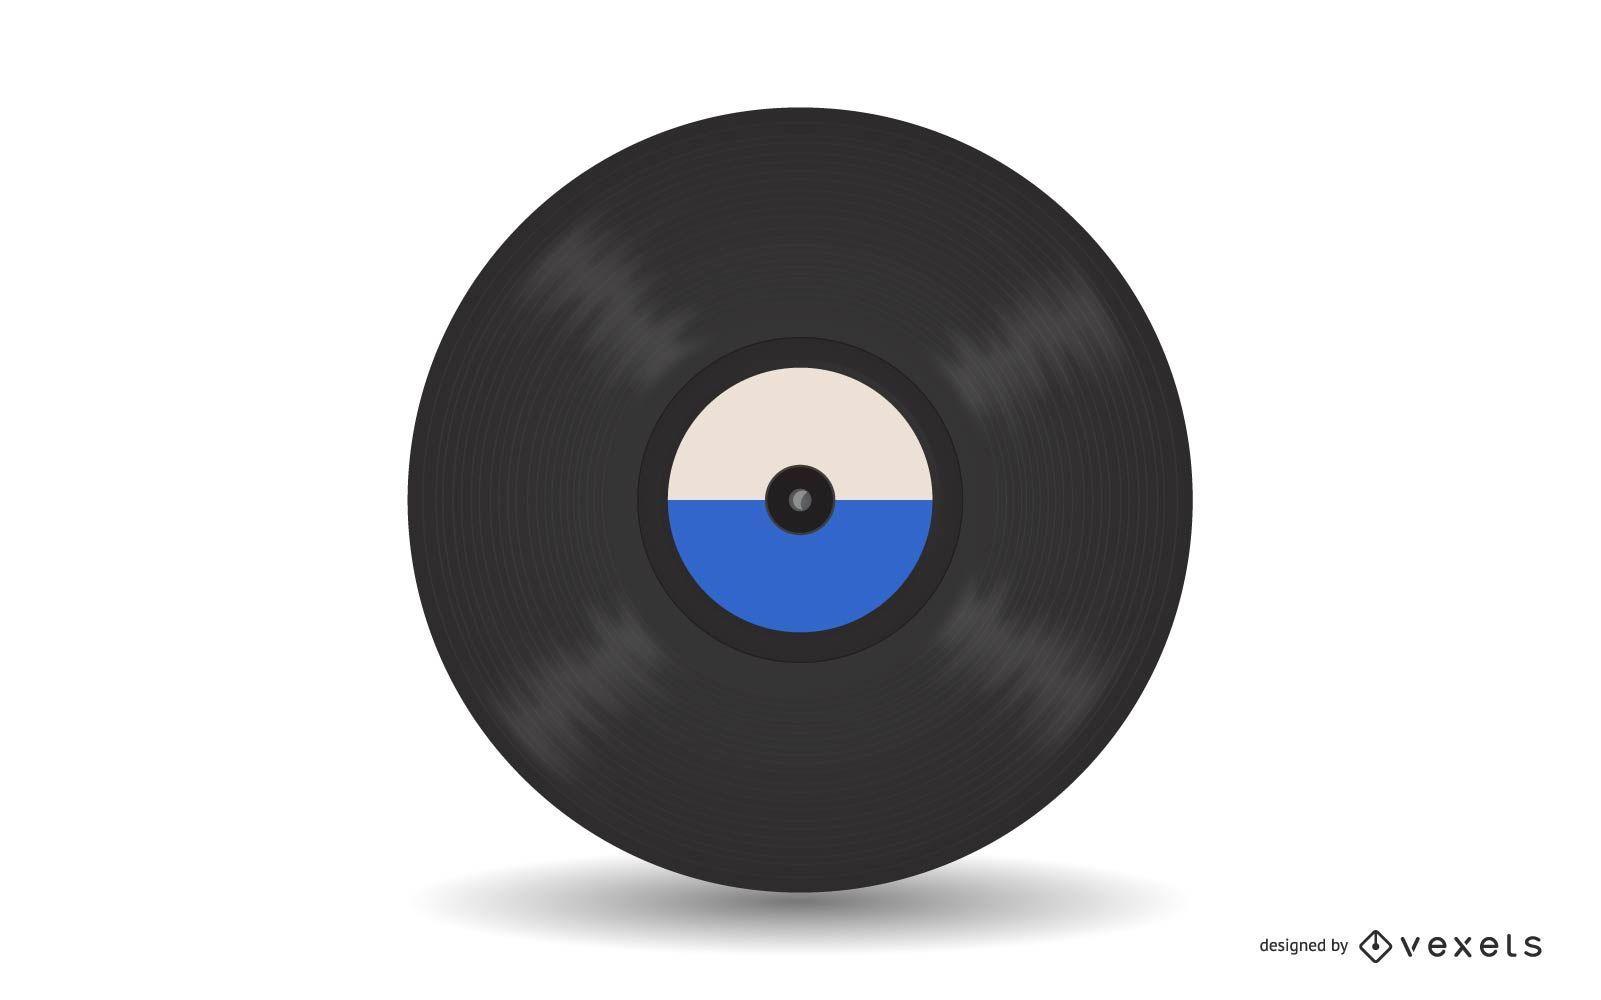 Vektor-Schallplatte